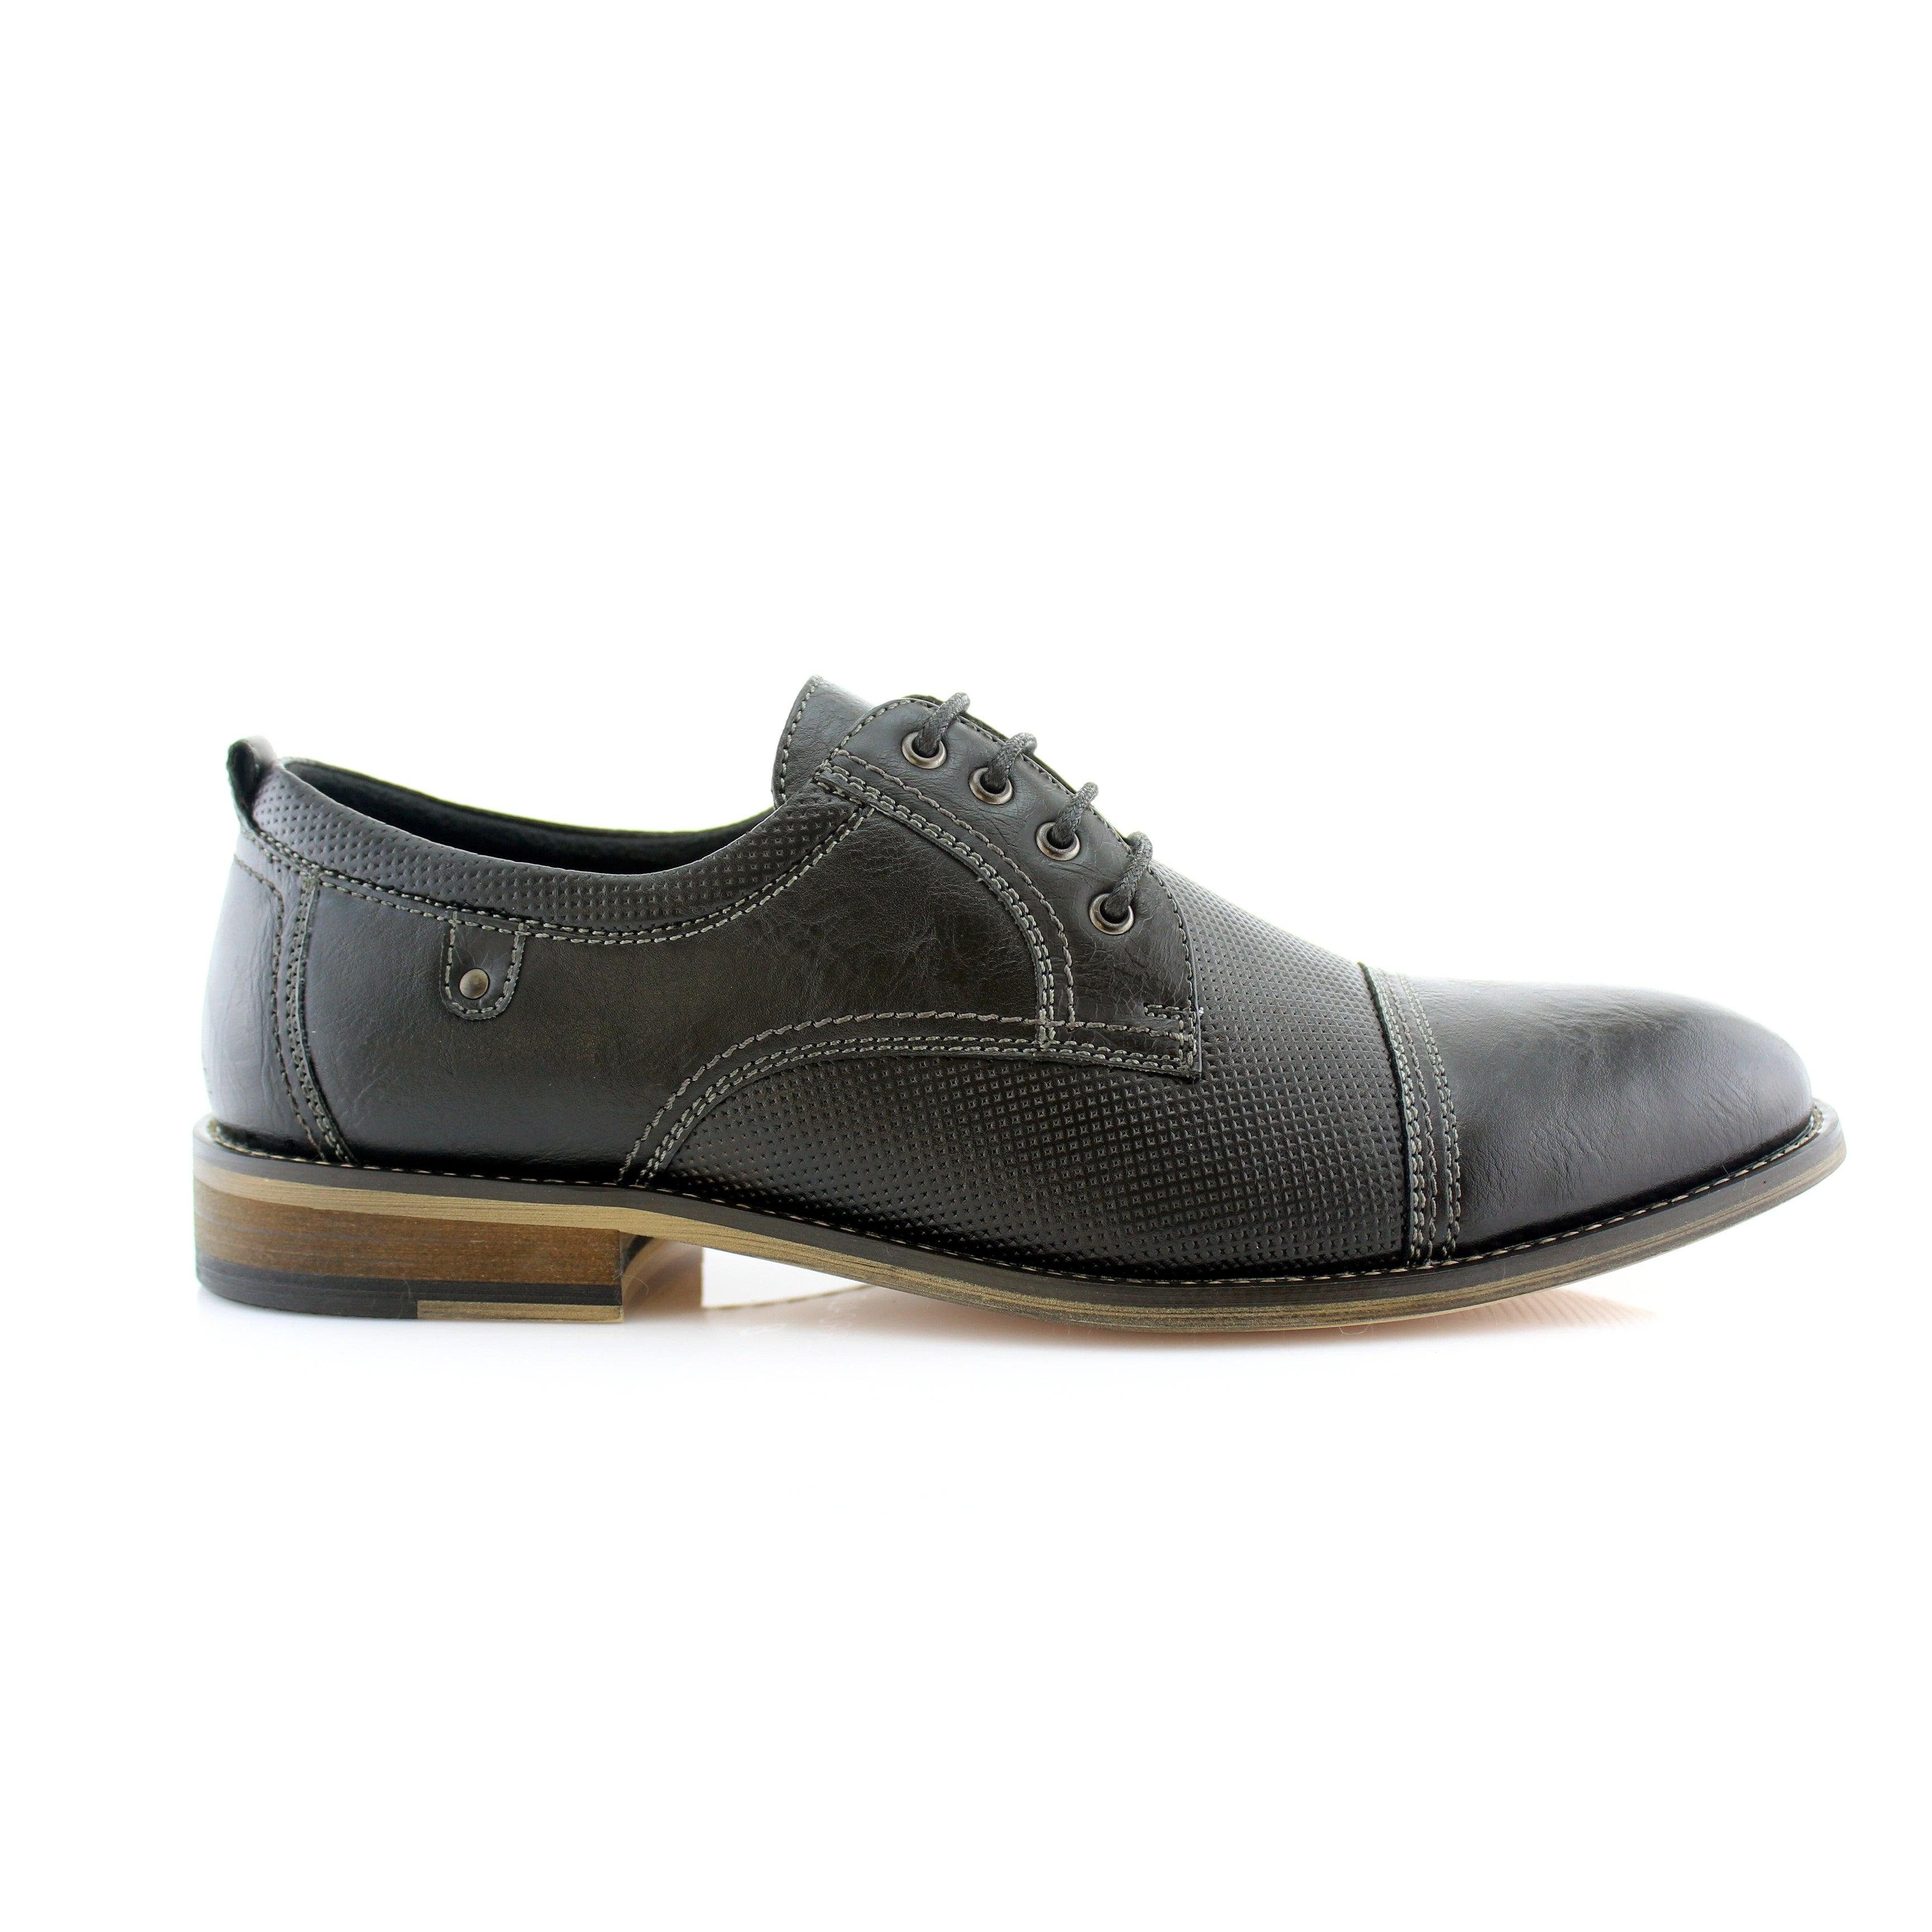 Ferro-Aldo-Felix-MFA19605L-Men-039-s-Dress-Shoes-For-Work-or thumbnail 8